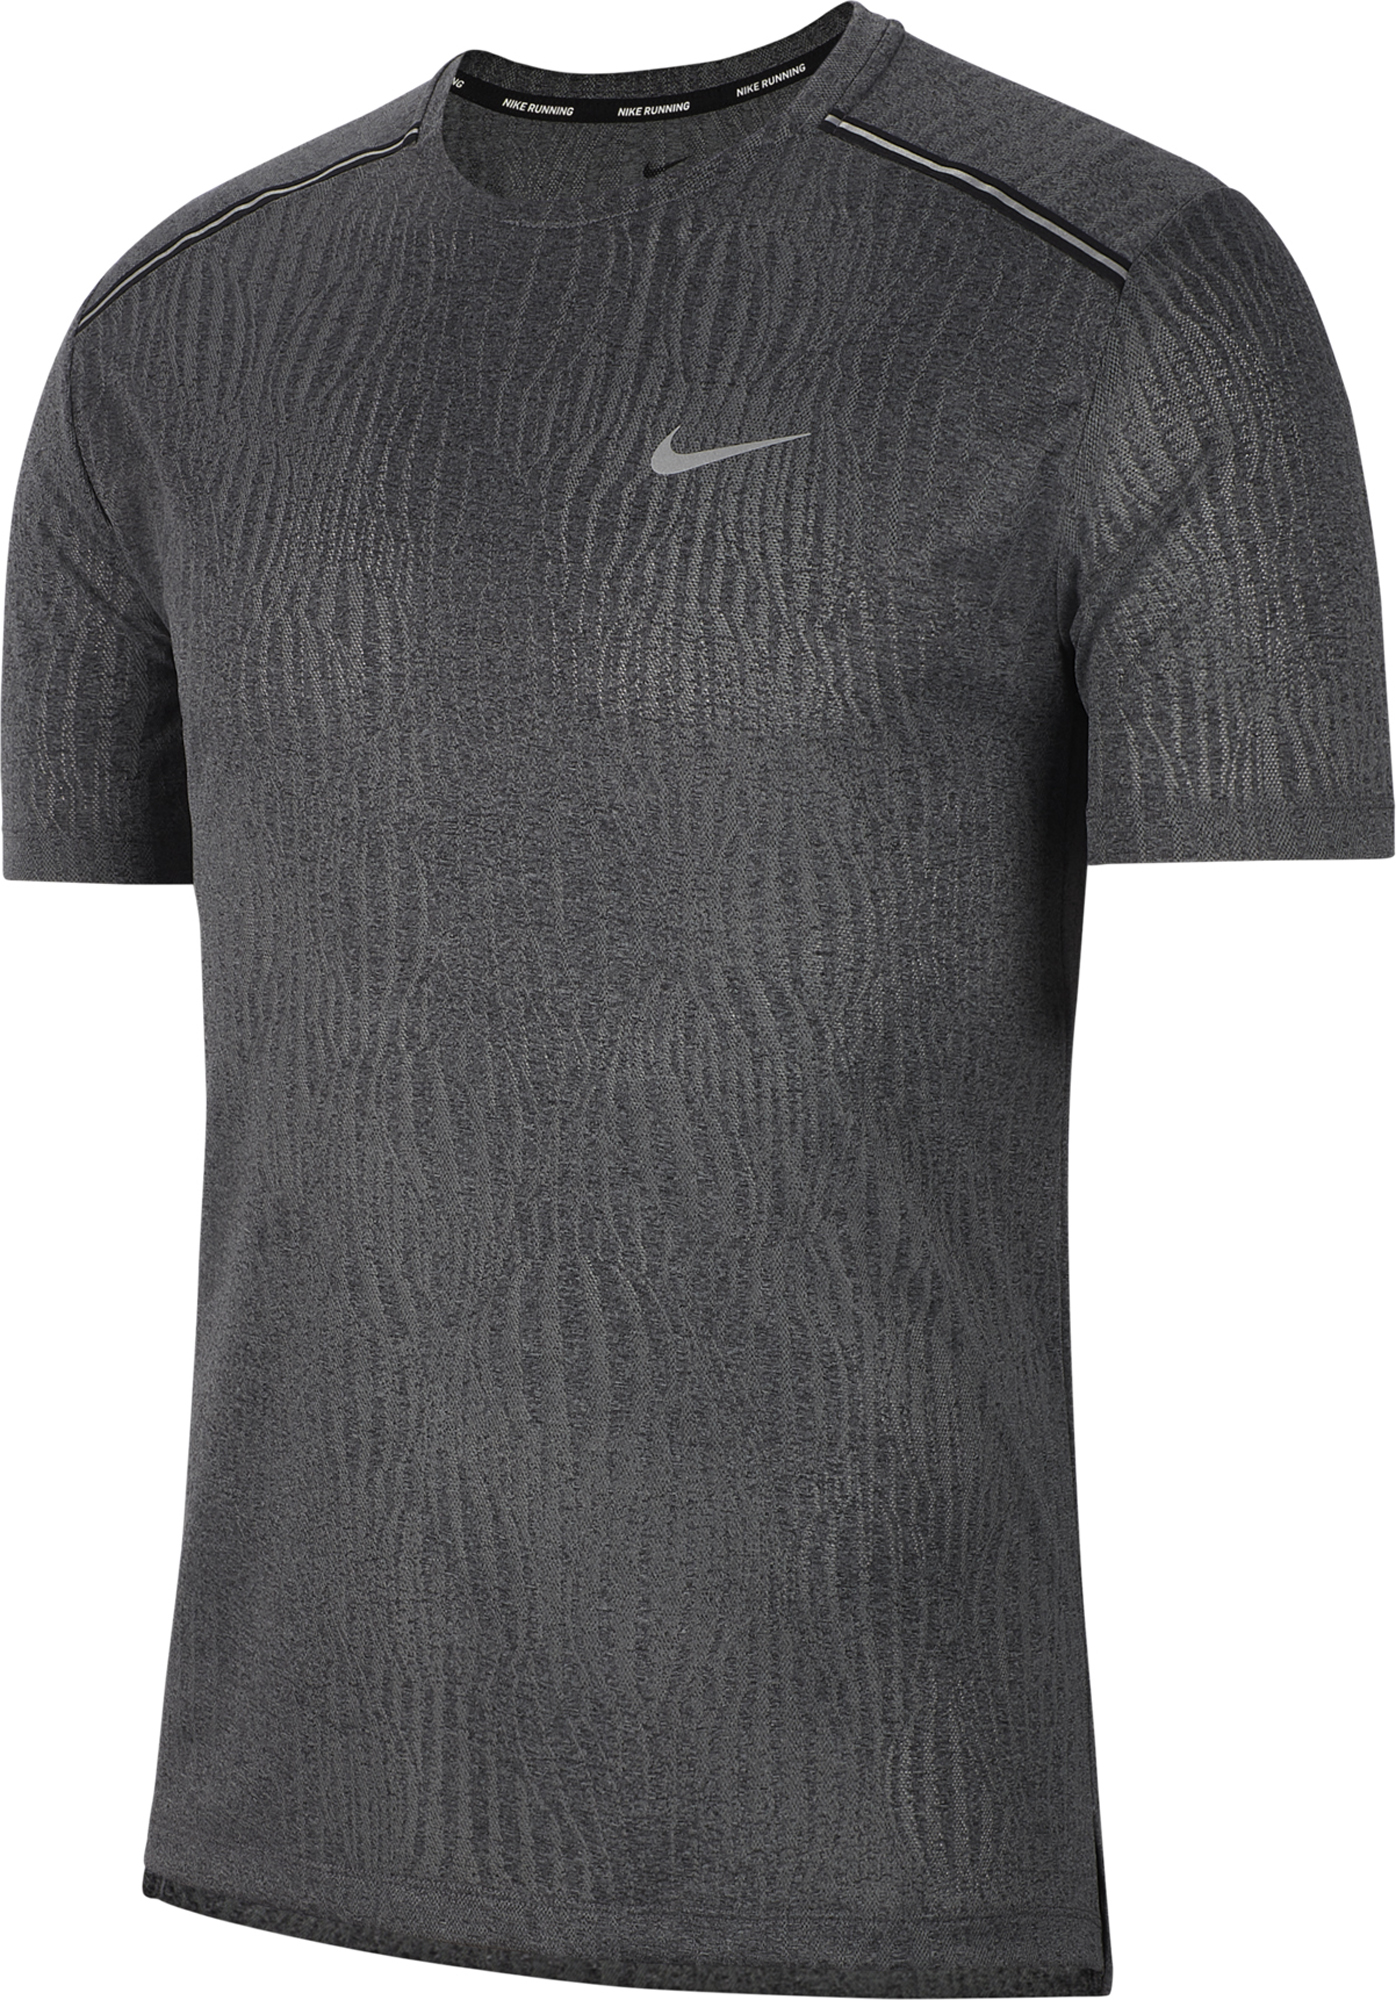 Nike Футболка мужская Nike Dri-FIT Miler, размер 46-48 nike ветровка мужская nike nk essntl размер 46 48